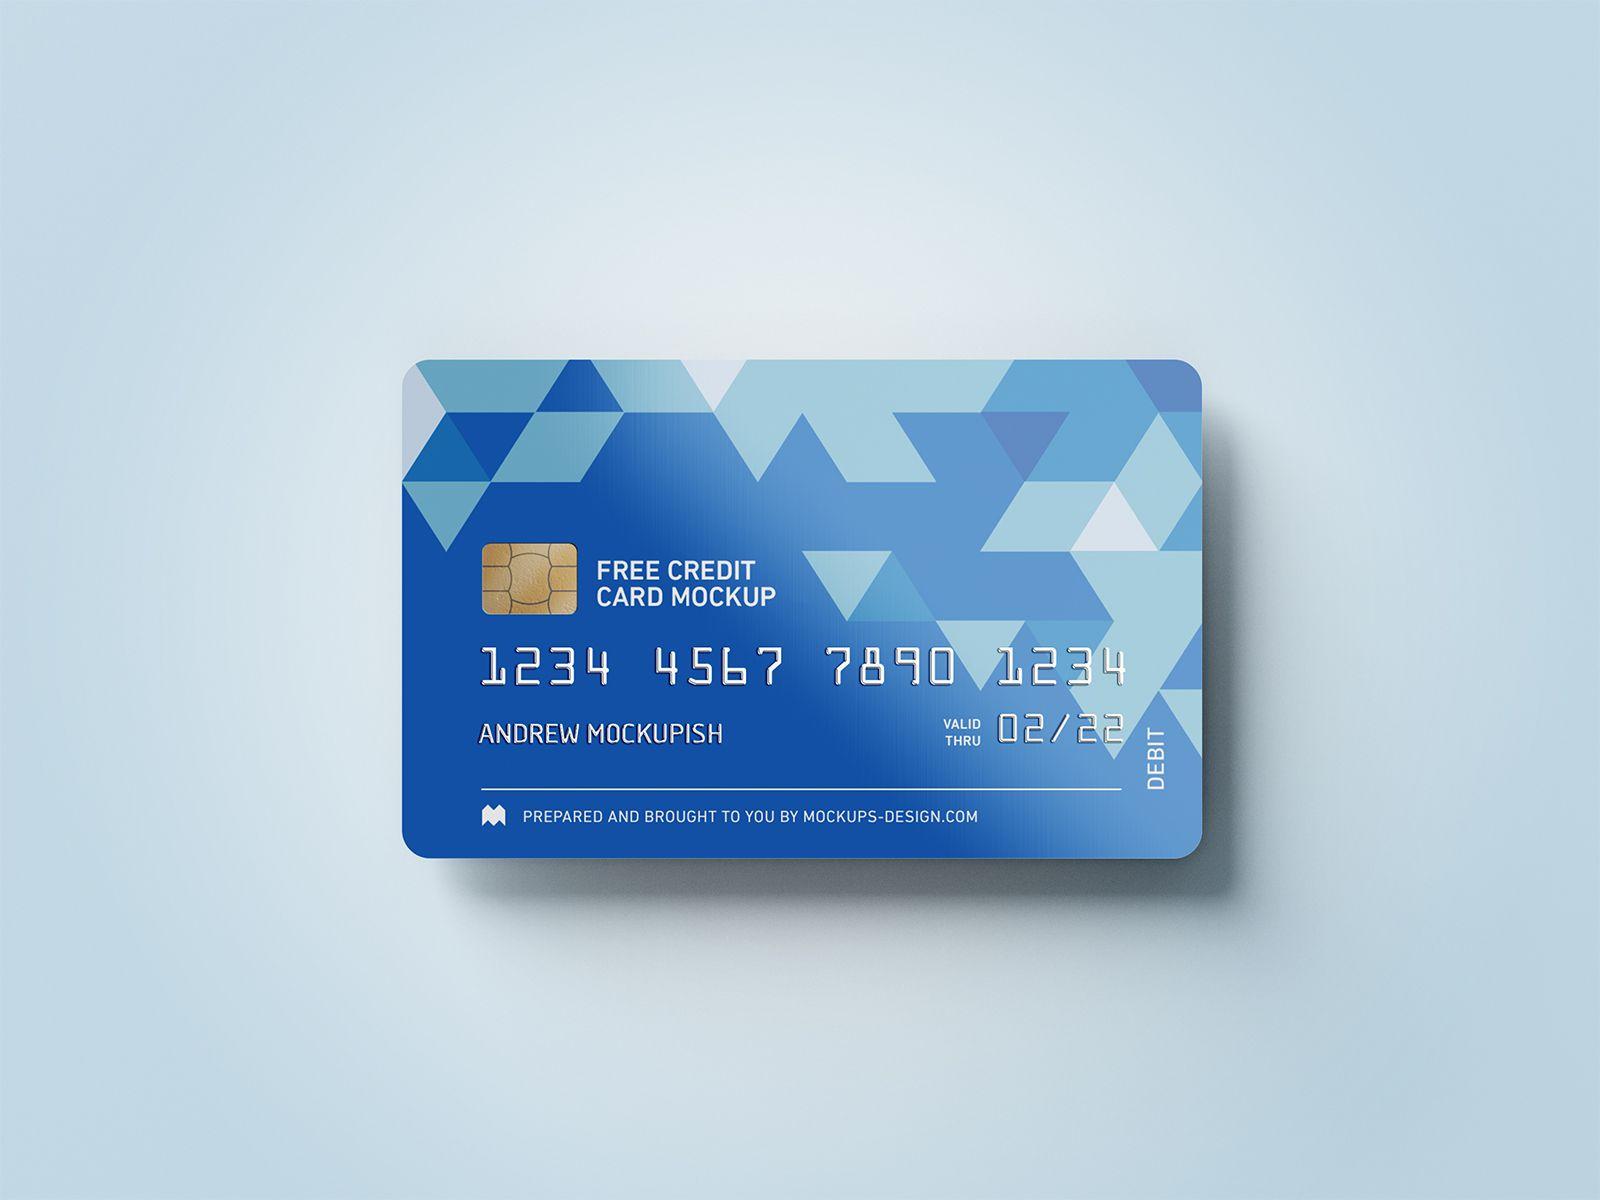 Free Credit Card Mockup Psd Free Mockup Free Credit Card Mockup Free Psd Visa Card Numbers